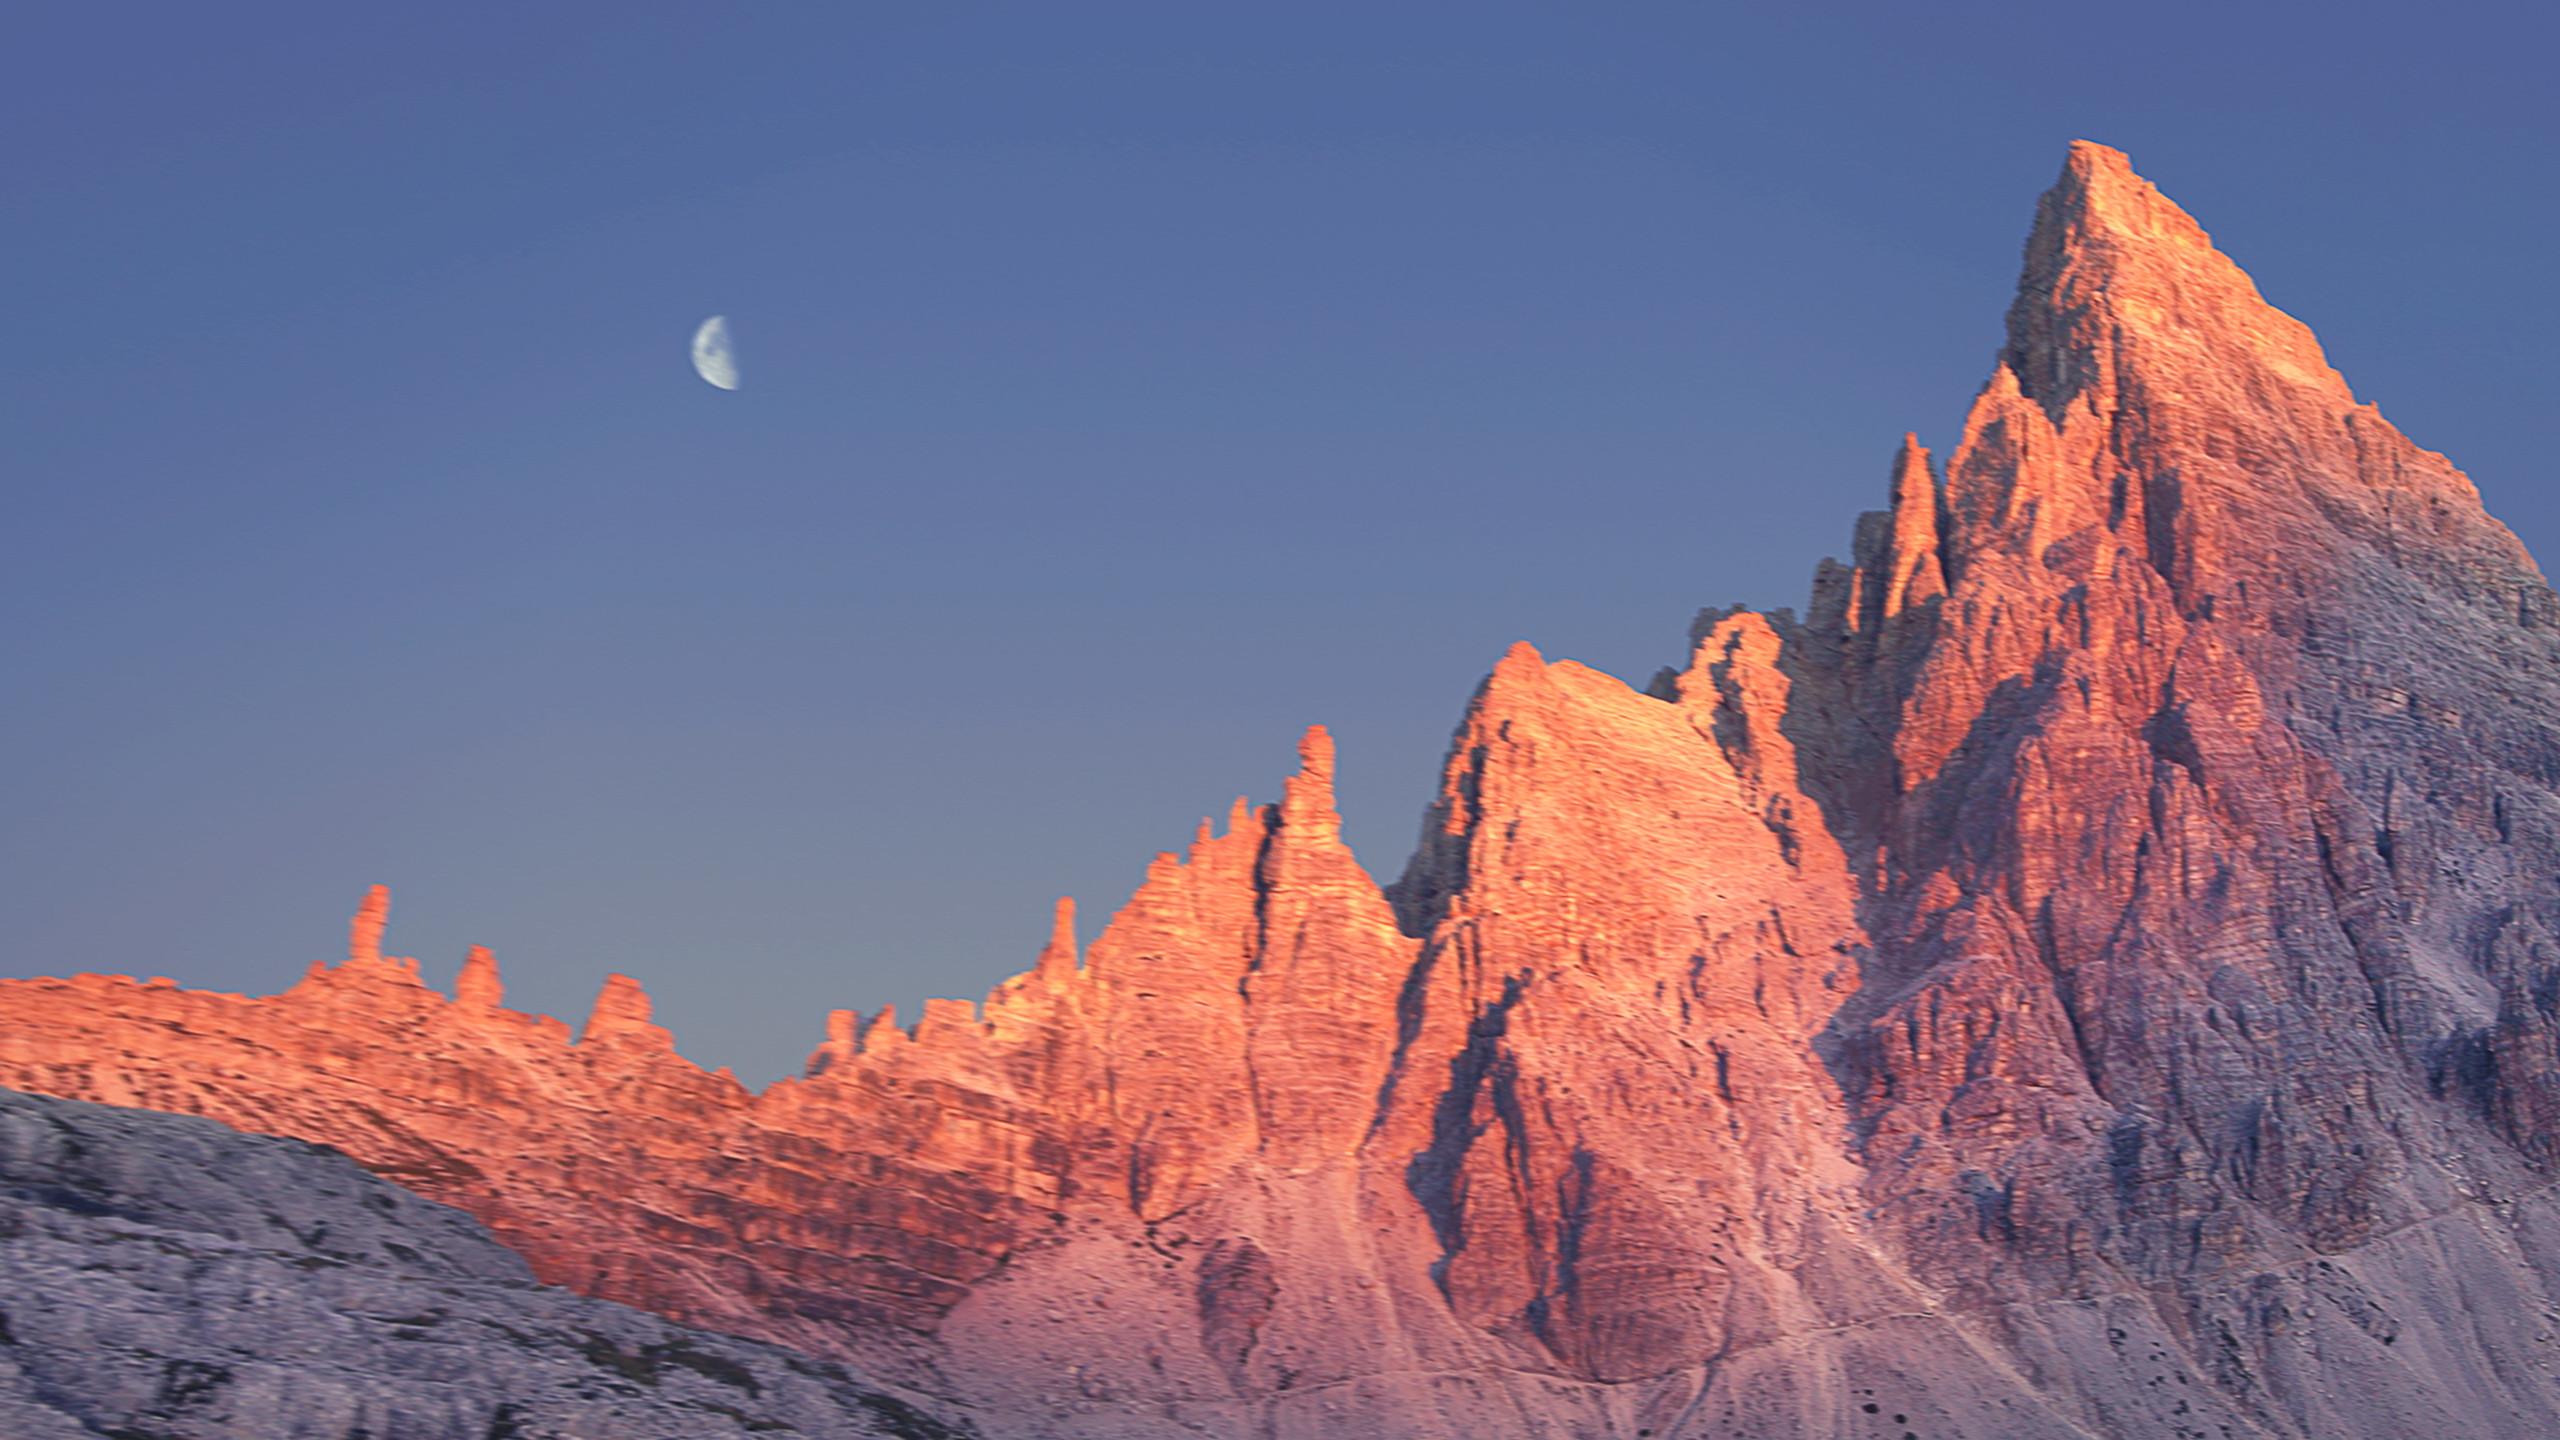 Macbook Background: IMac HD Wallpaper (68+ Images